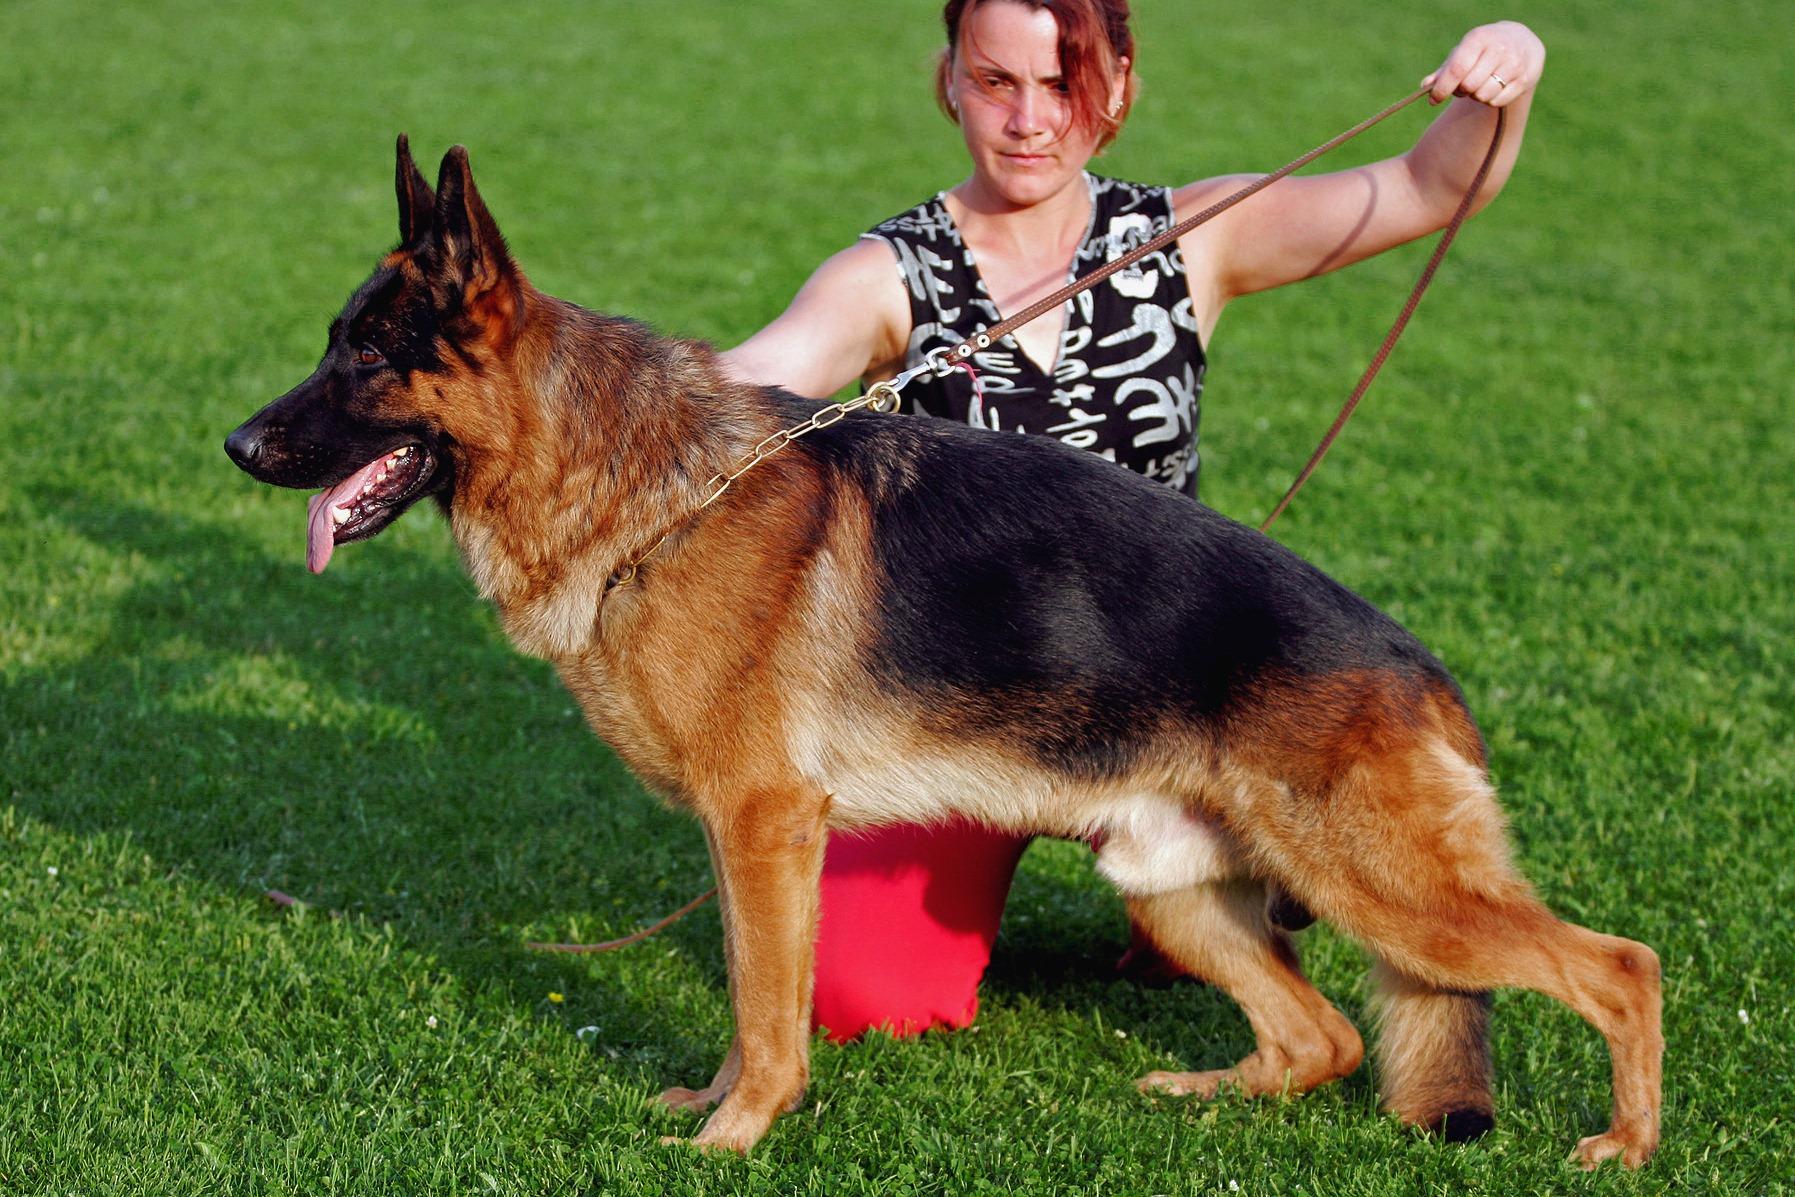 Как научить собаку командам в домашних условиях, каким 20